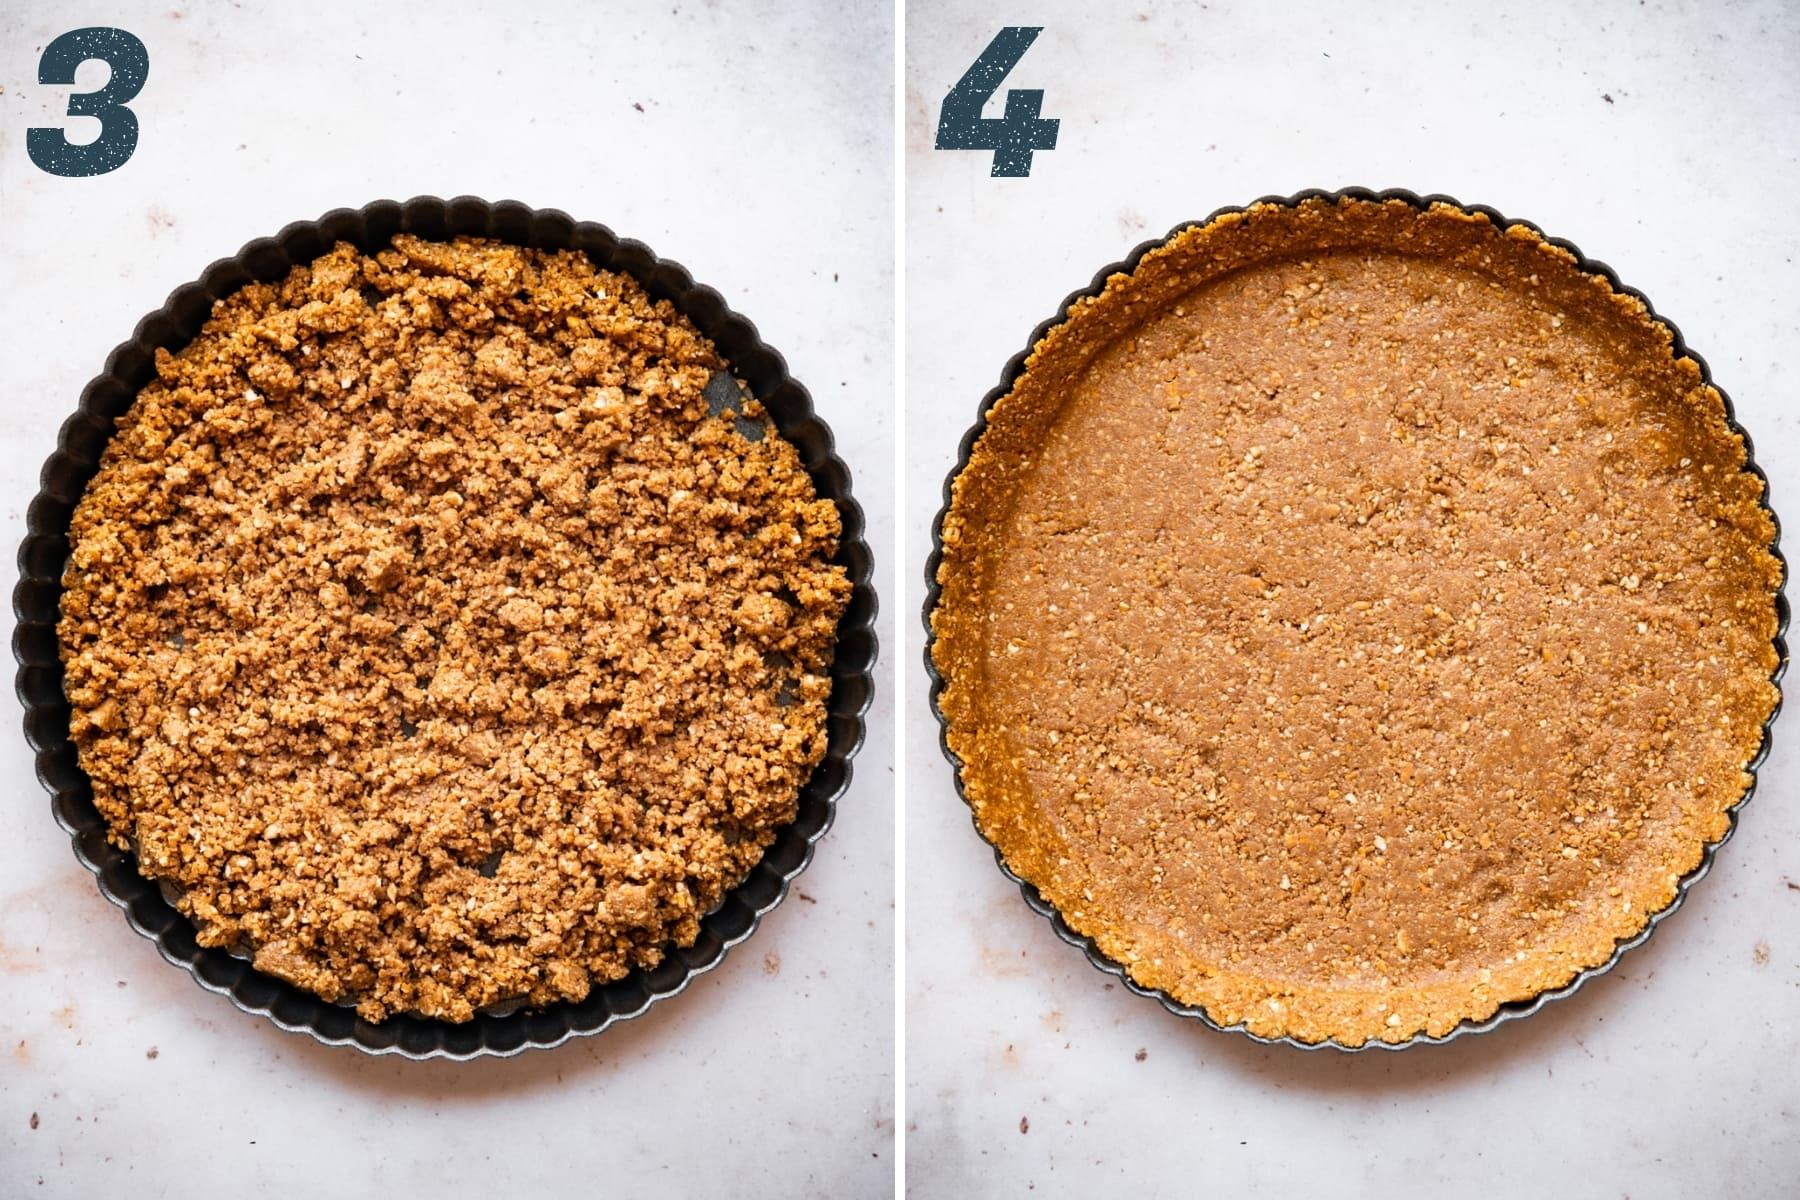 pressing peanut butter pretzel crust into tart pan.